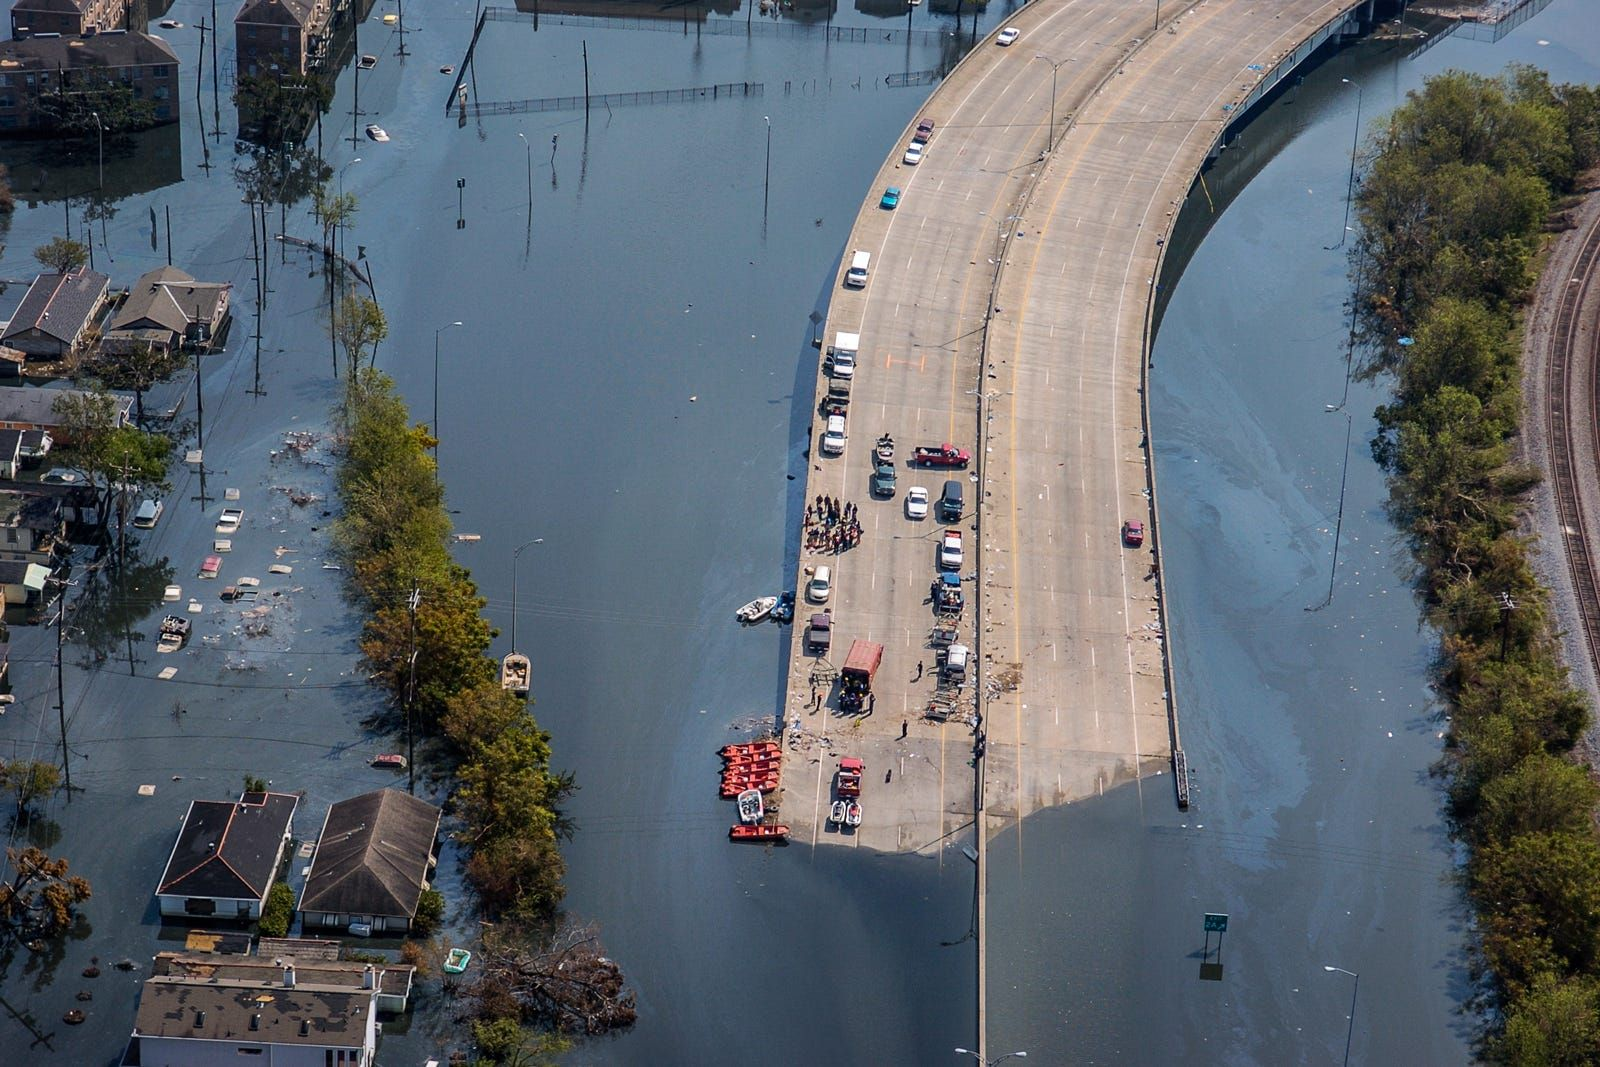 4 Photographers Devastating Images Of Hurricane Katrina 10 Years Later Hurricane Katrina New Orleans Hurricane Katrina Katrina